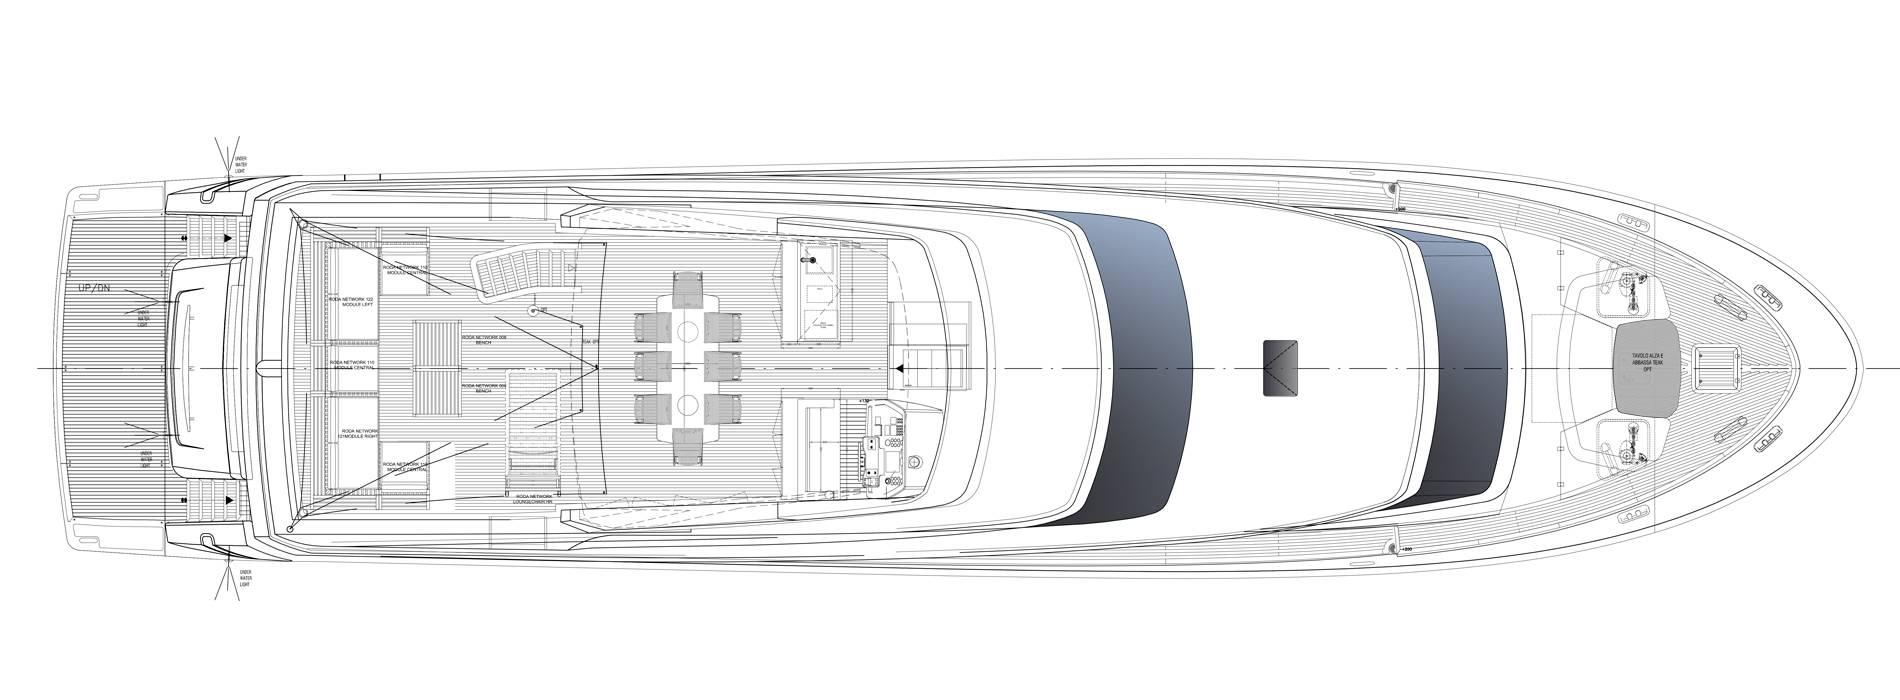 Sanlorenzo Yachts SL96-635 Flying bridge